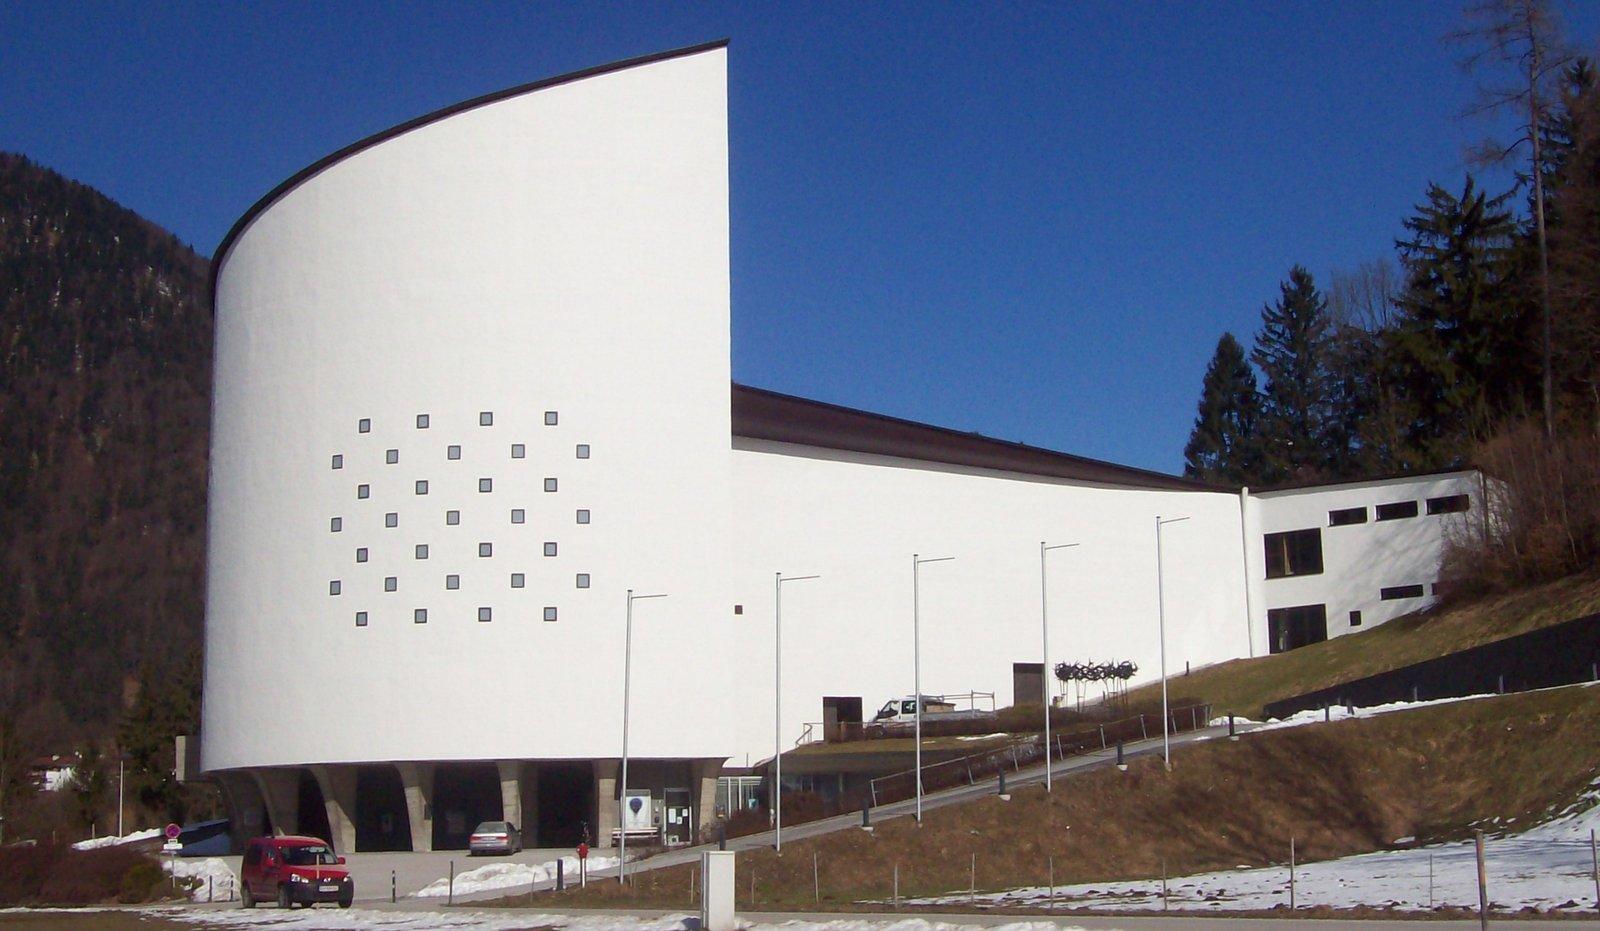 Inntal-Radweg - Passionspielhaus Erl